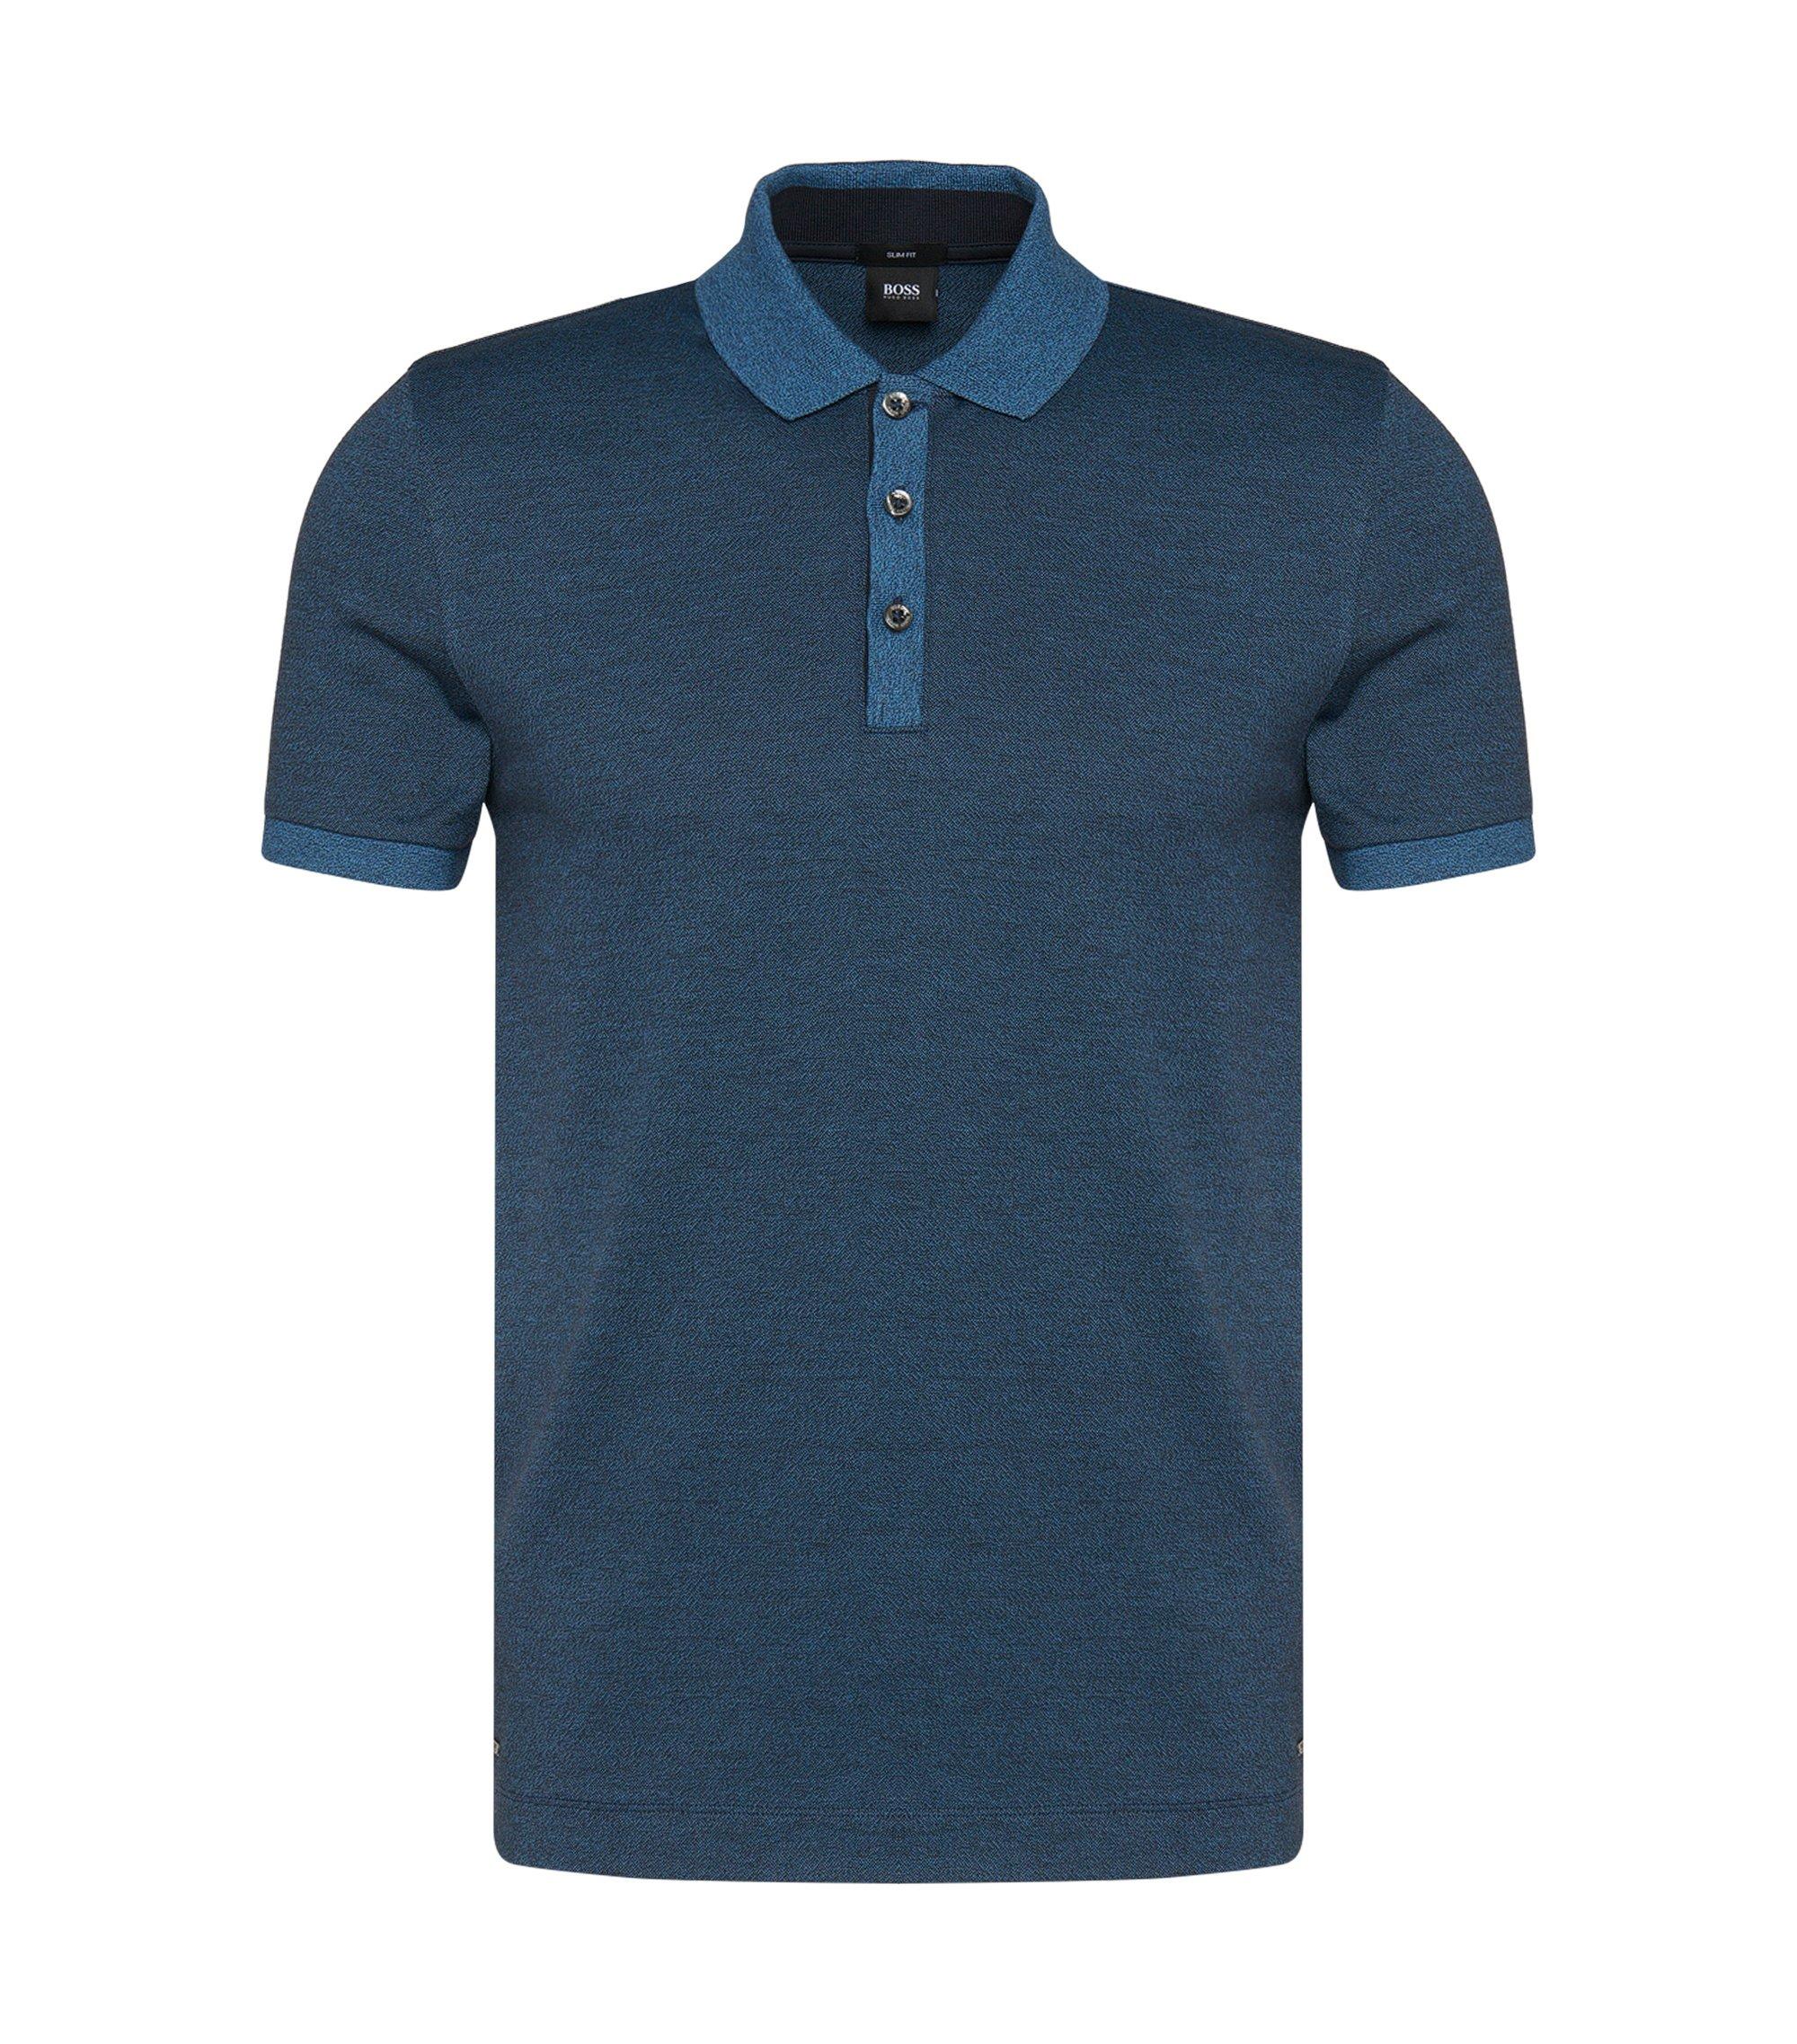 Cotton Moluine Melange Polo Shirt, Slim Fit | Phillipson, Dark Blue